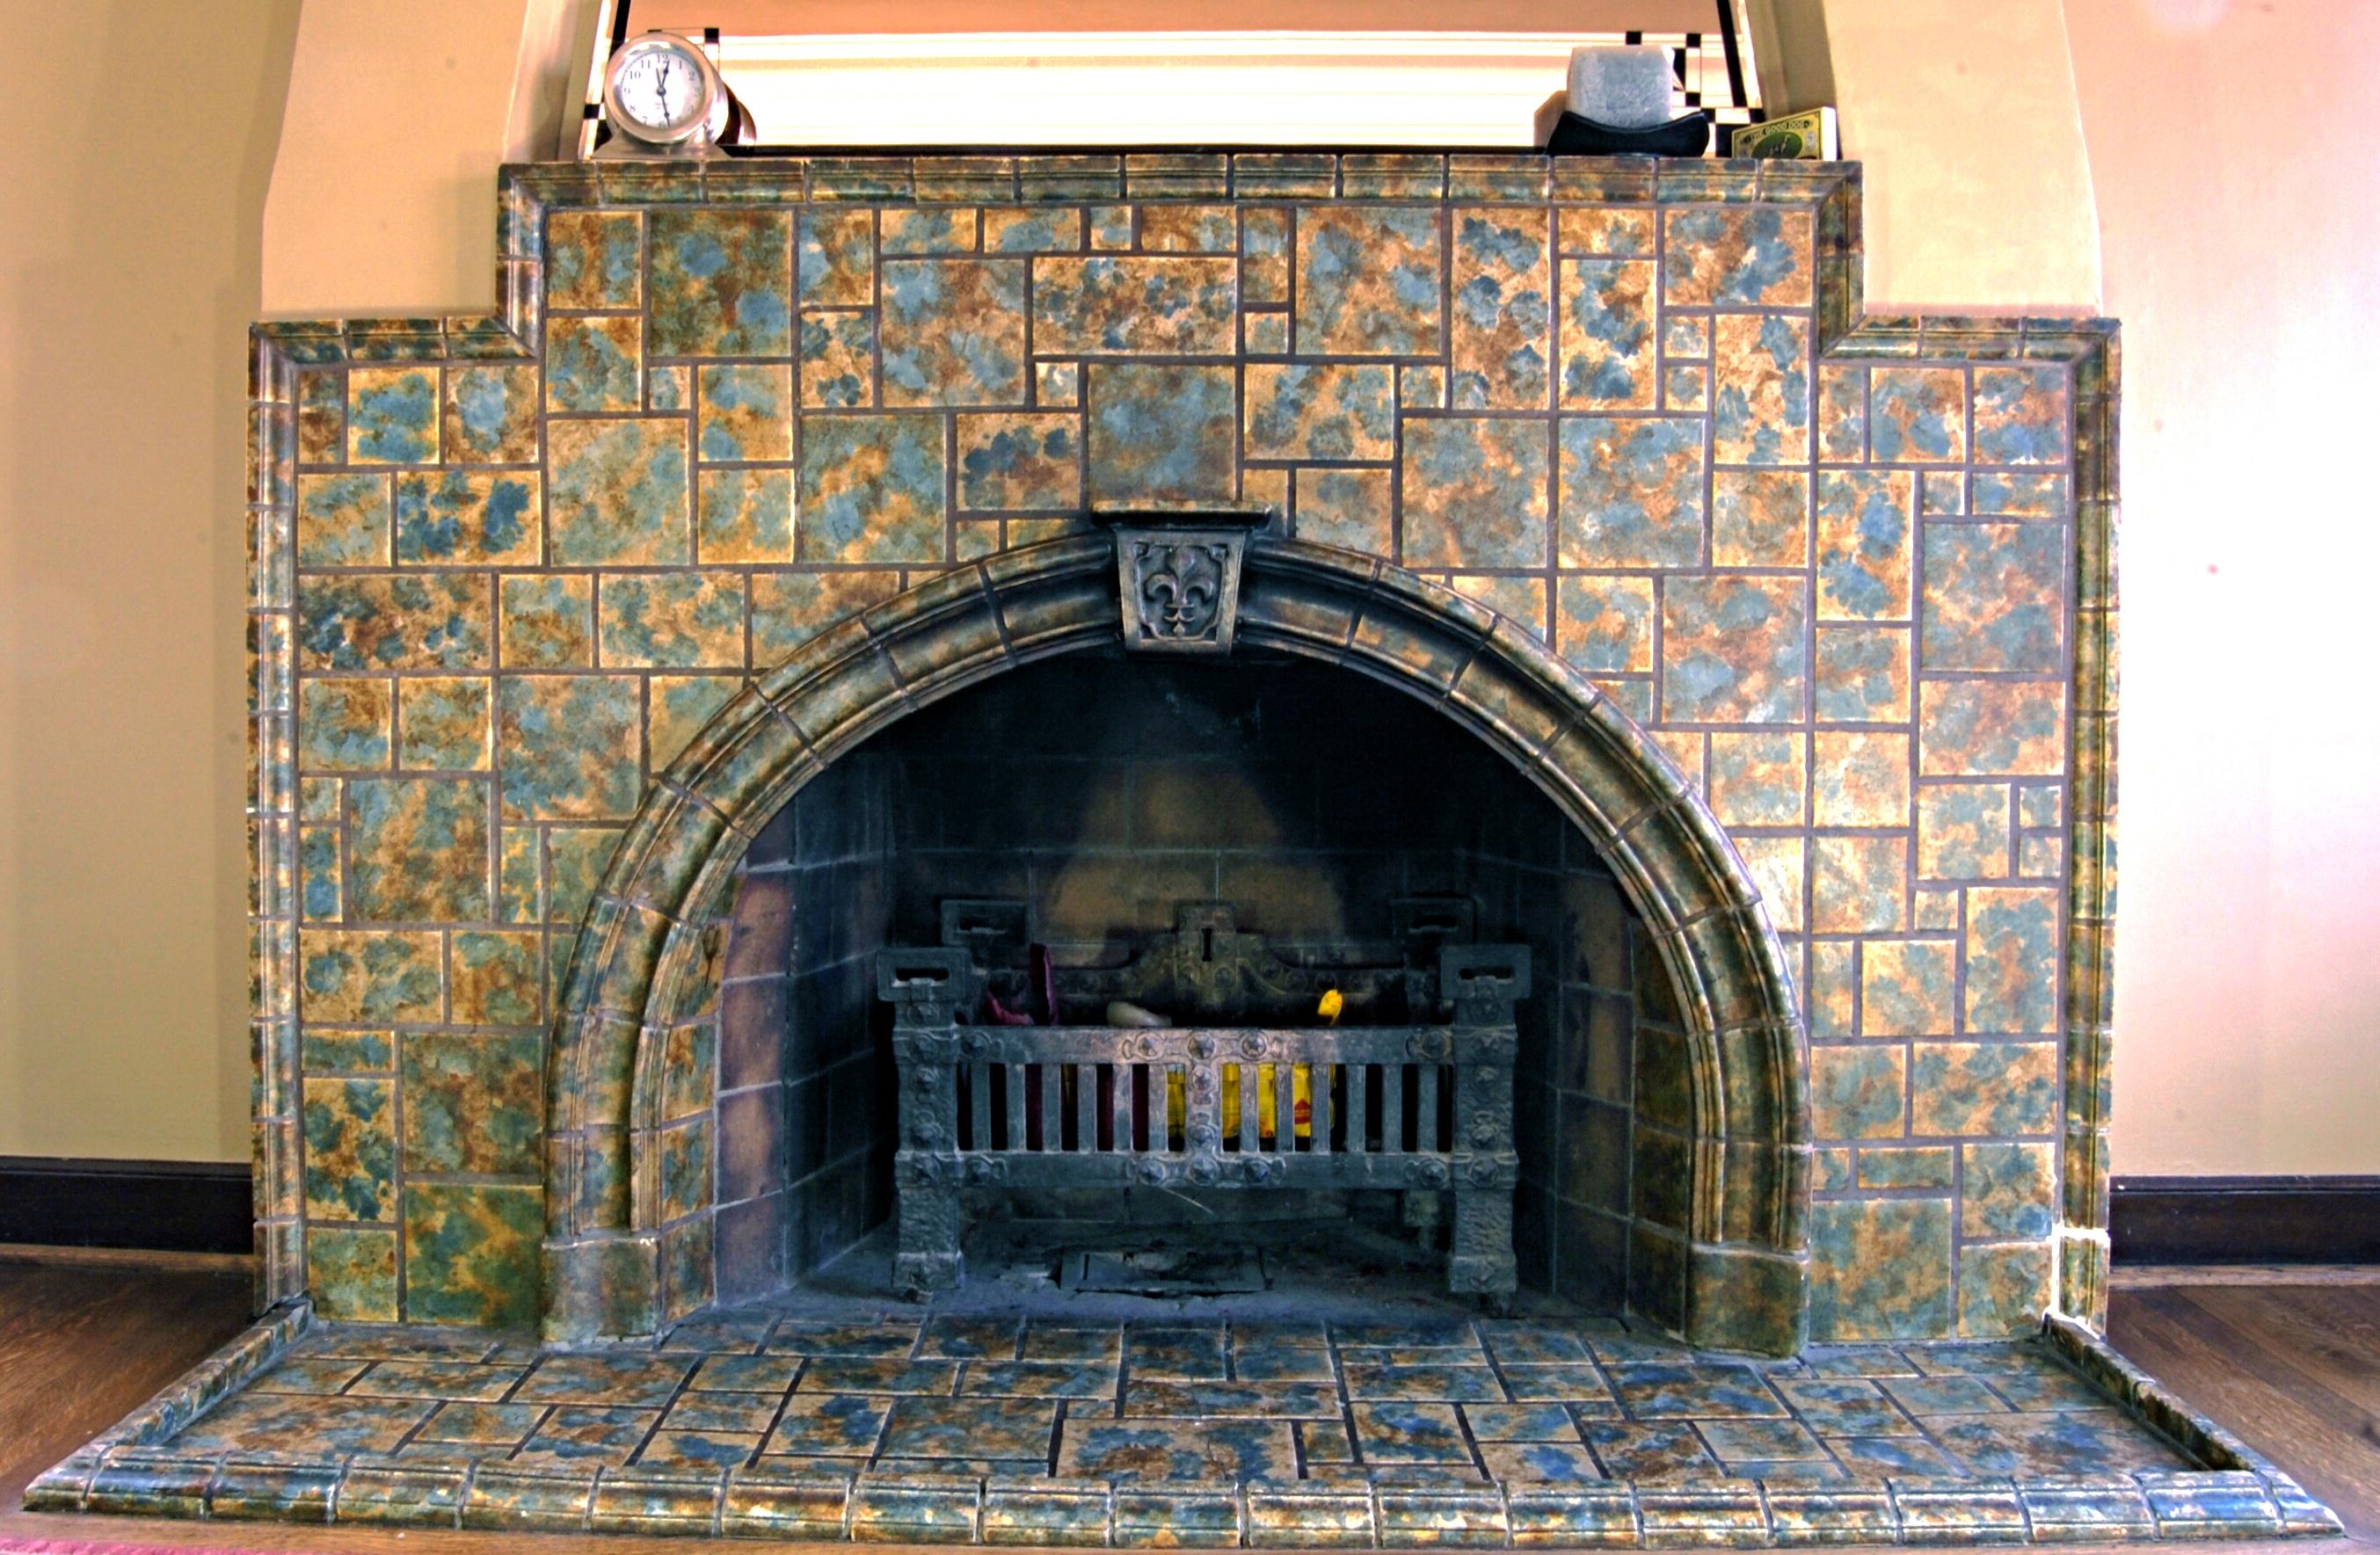 batchelder tile fireplaces u2013 keep educating and encouraging